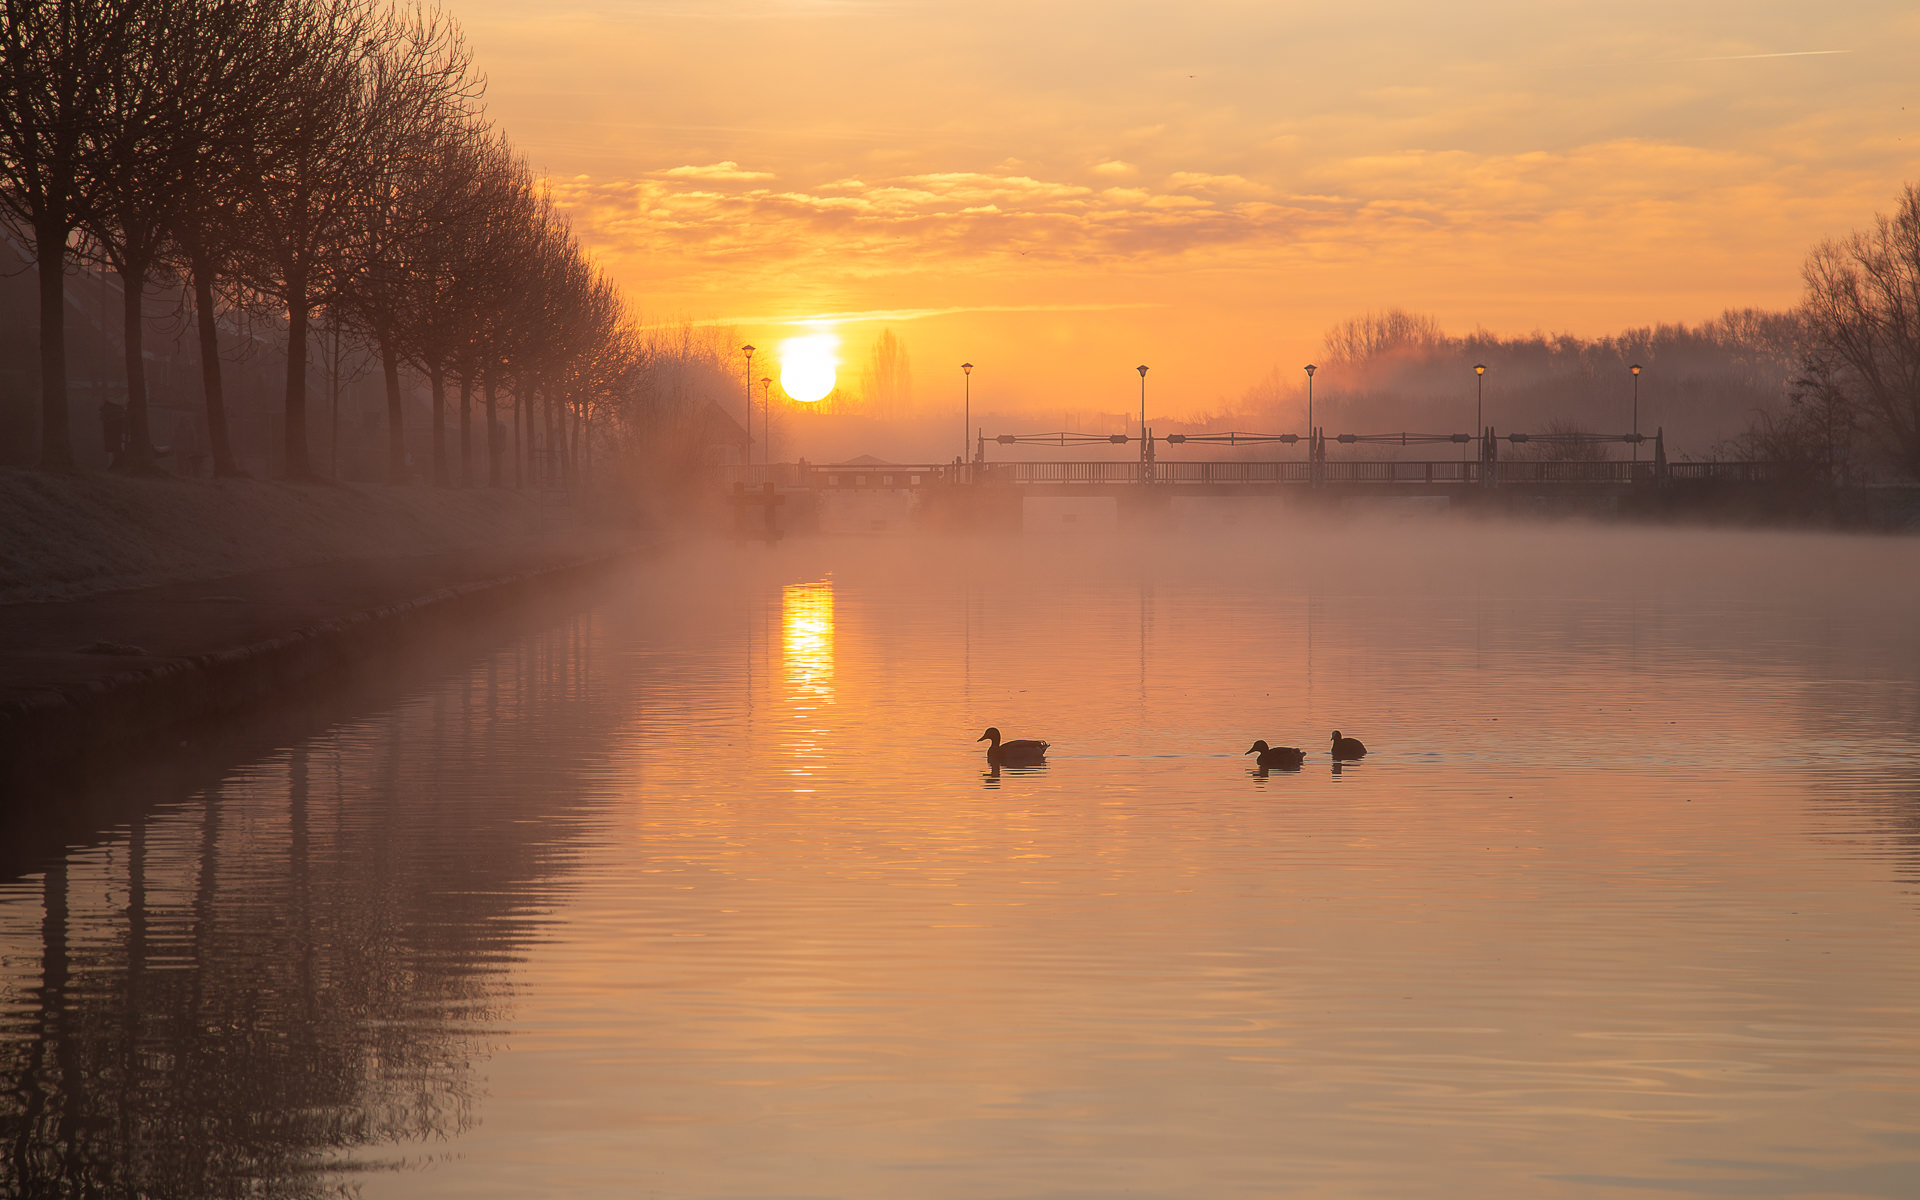 Sfeervolle zonsopkomst boven de Leie aan de oude sluizenkaai in Menen